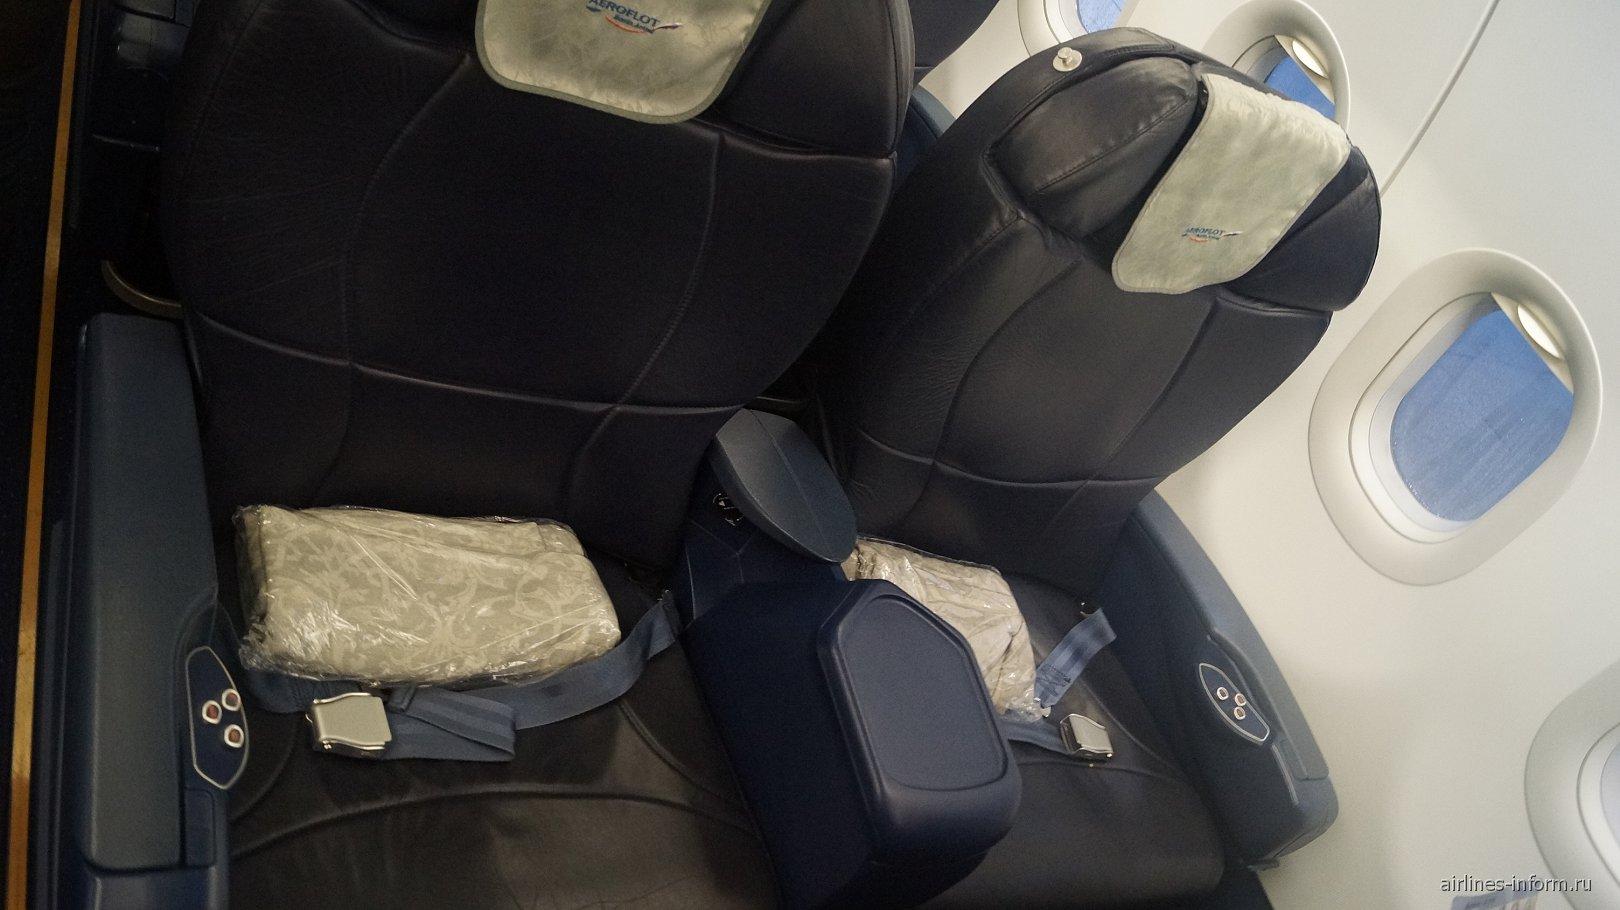 Кресла бизнес-класса самолета Airbus A319 Аэрофлота